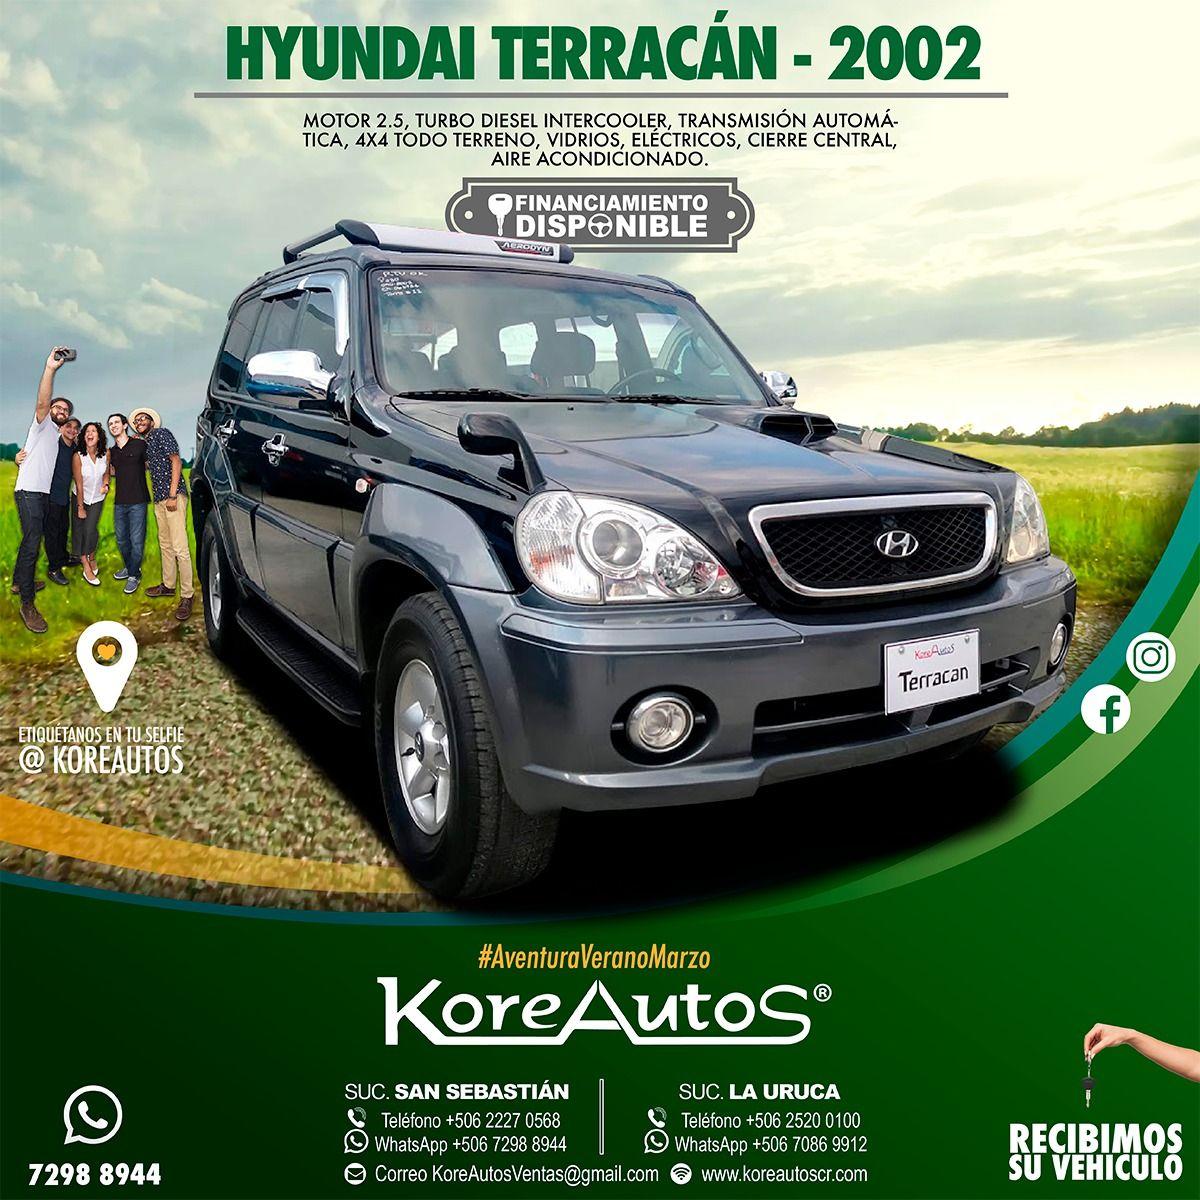 Hyundai Terracan 2002 Motor 2.5 Turbo Diesel